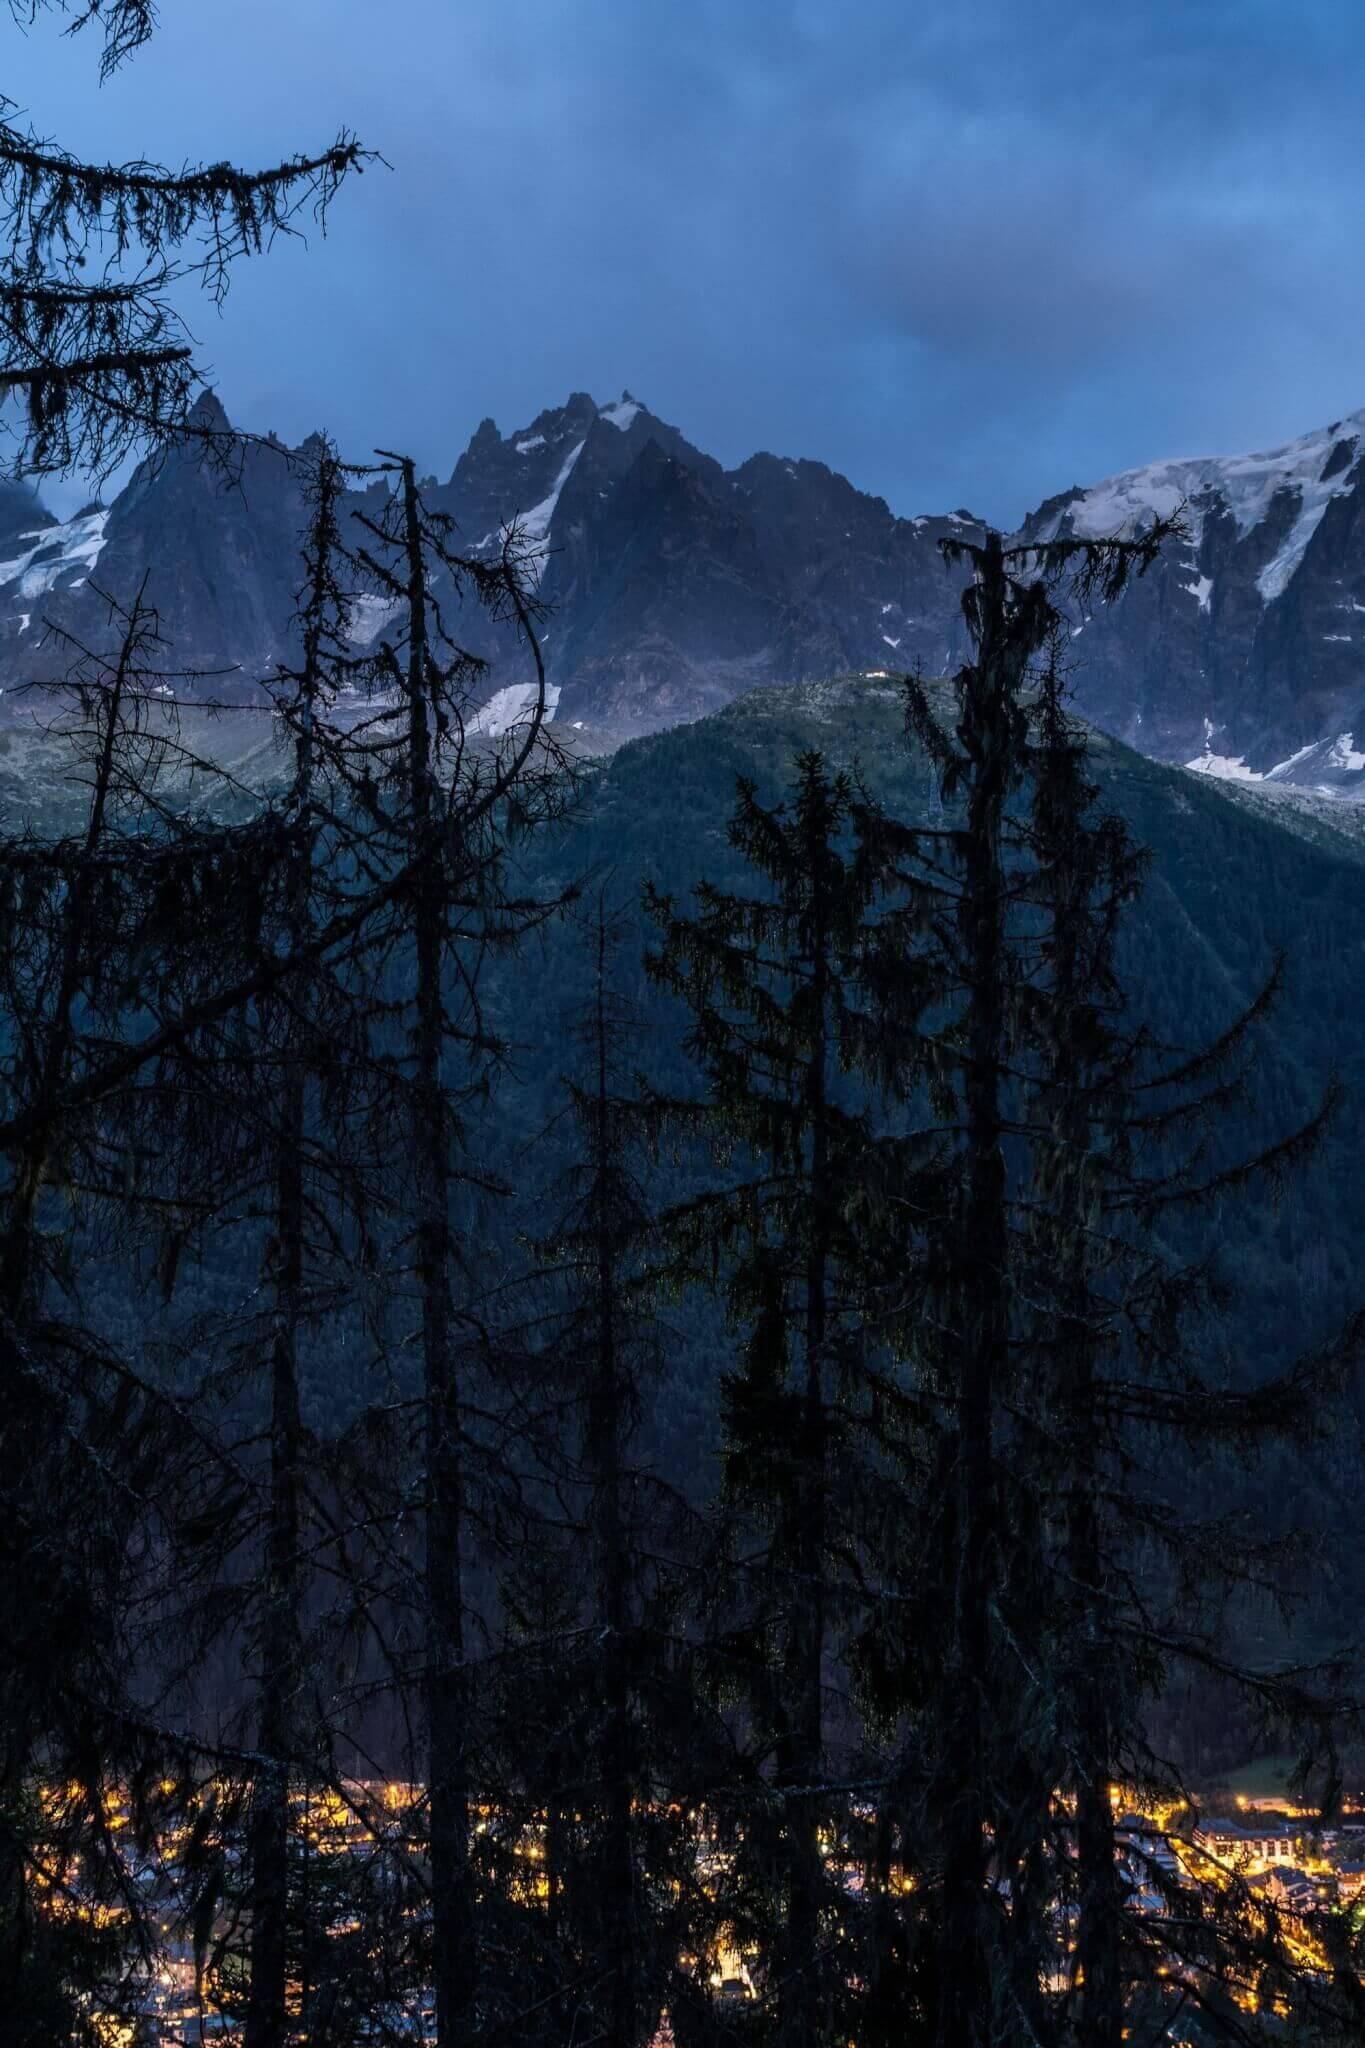 Chamonix at Twilight